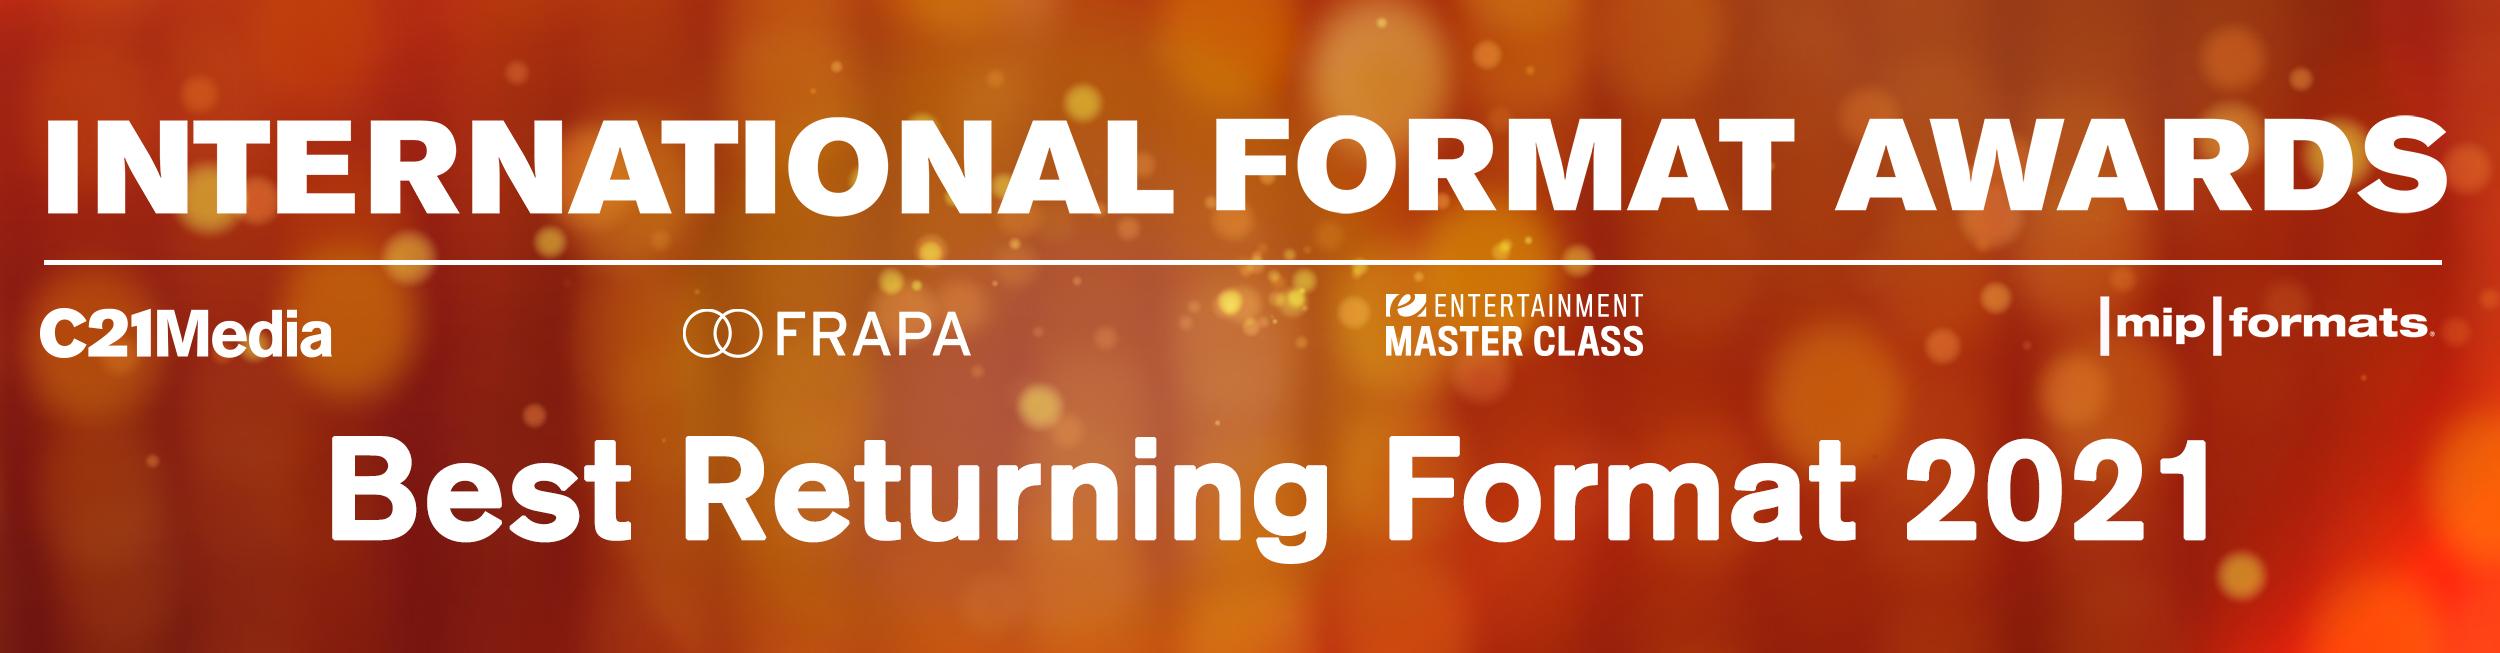 IFA Returning Banner 2021